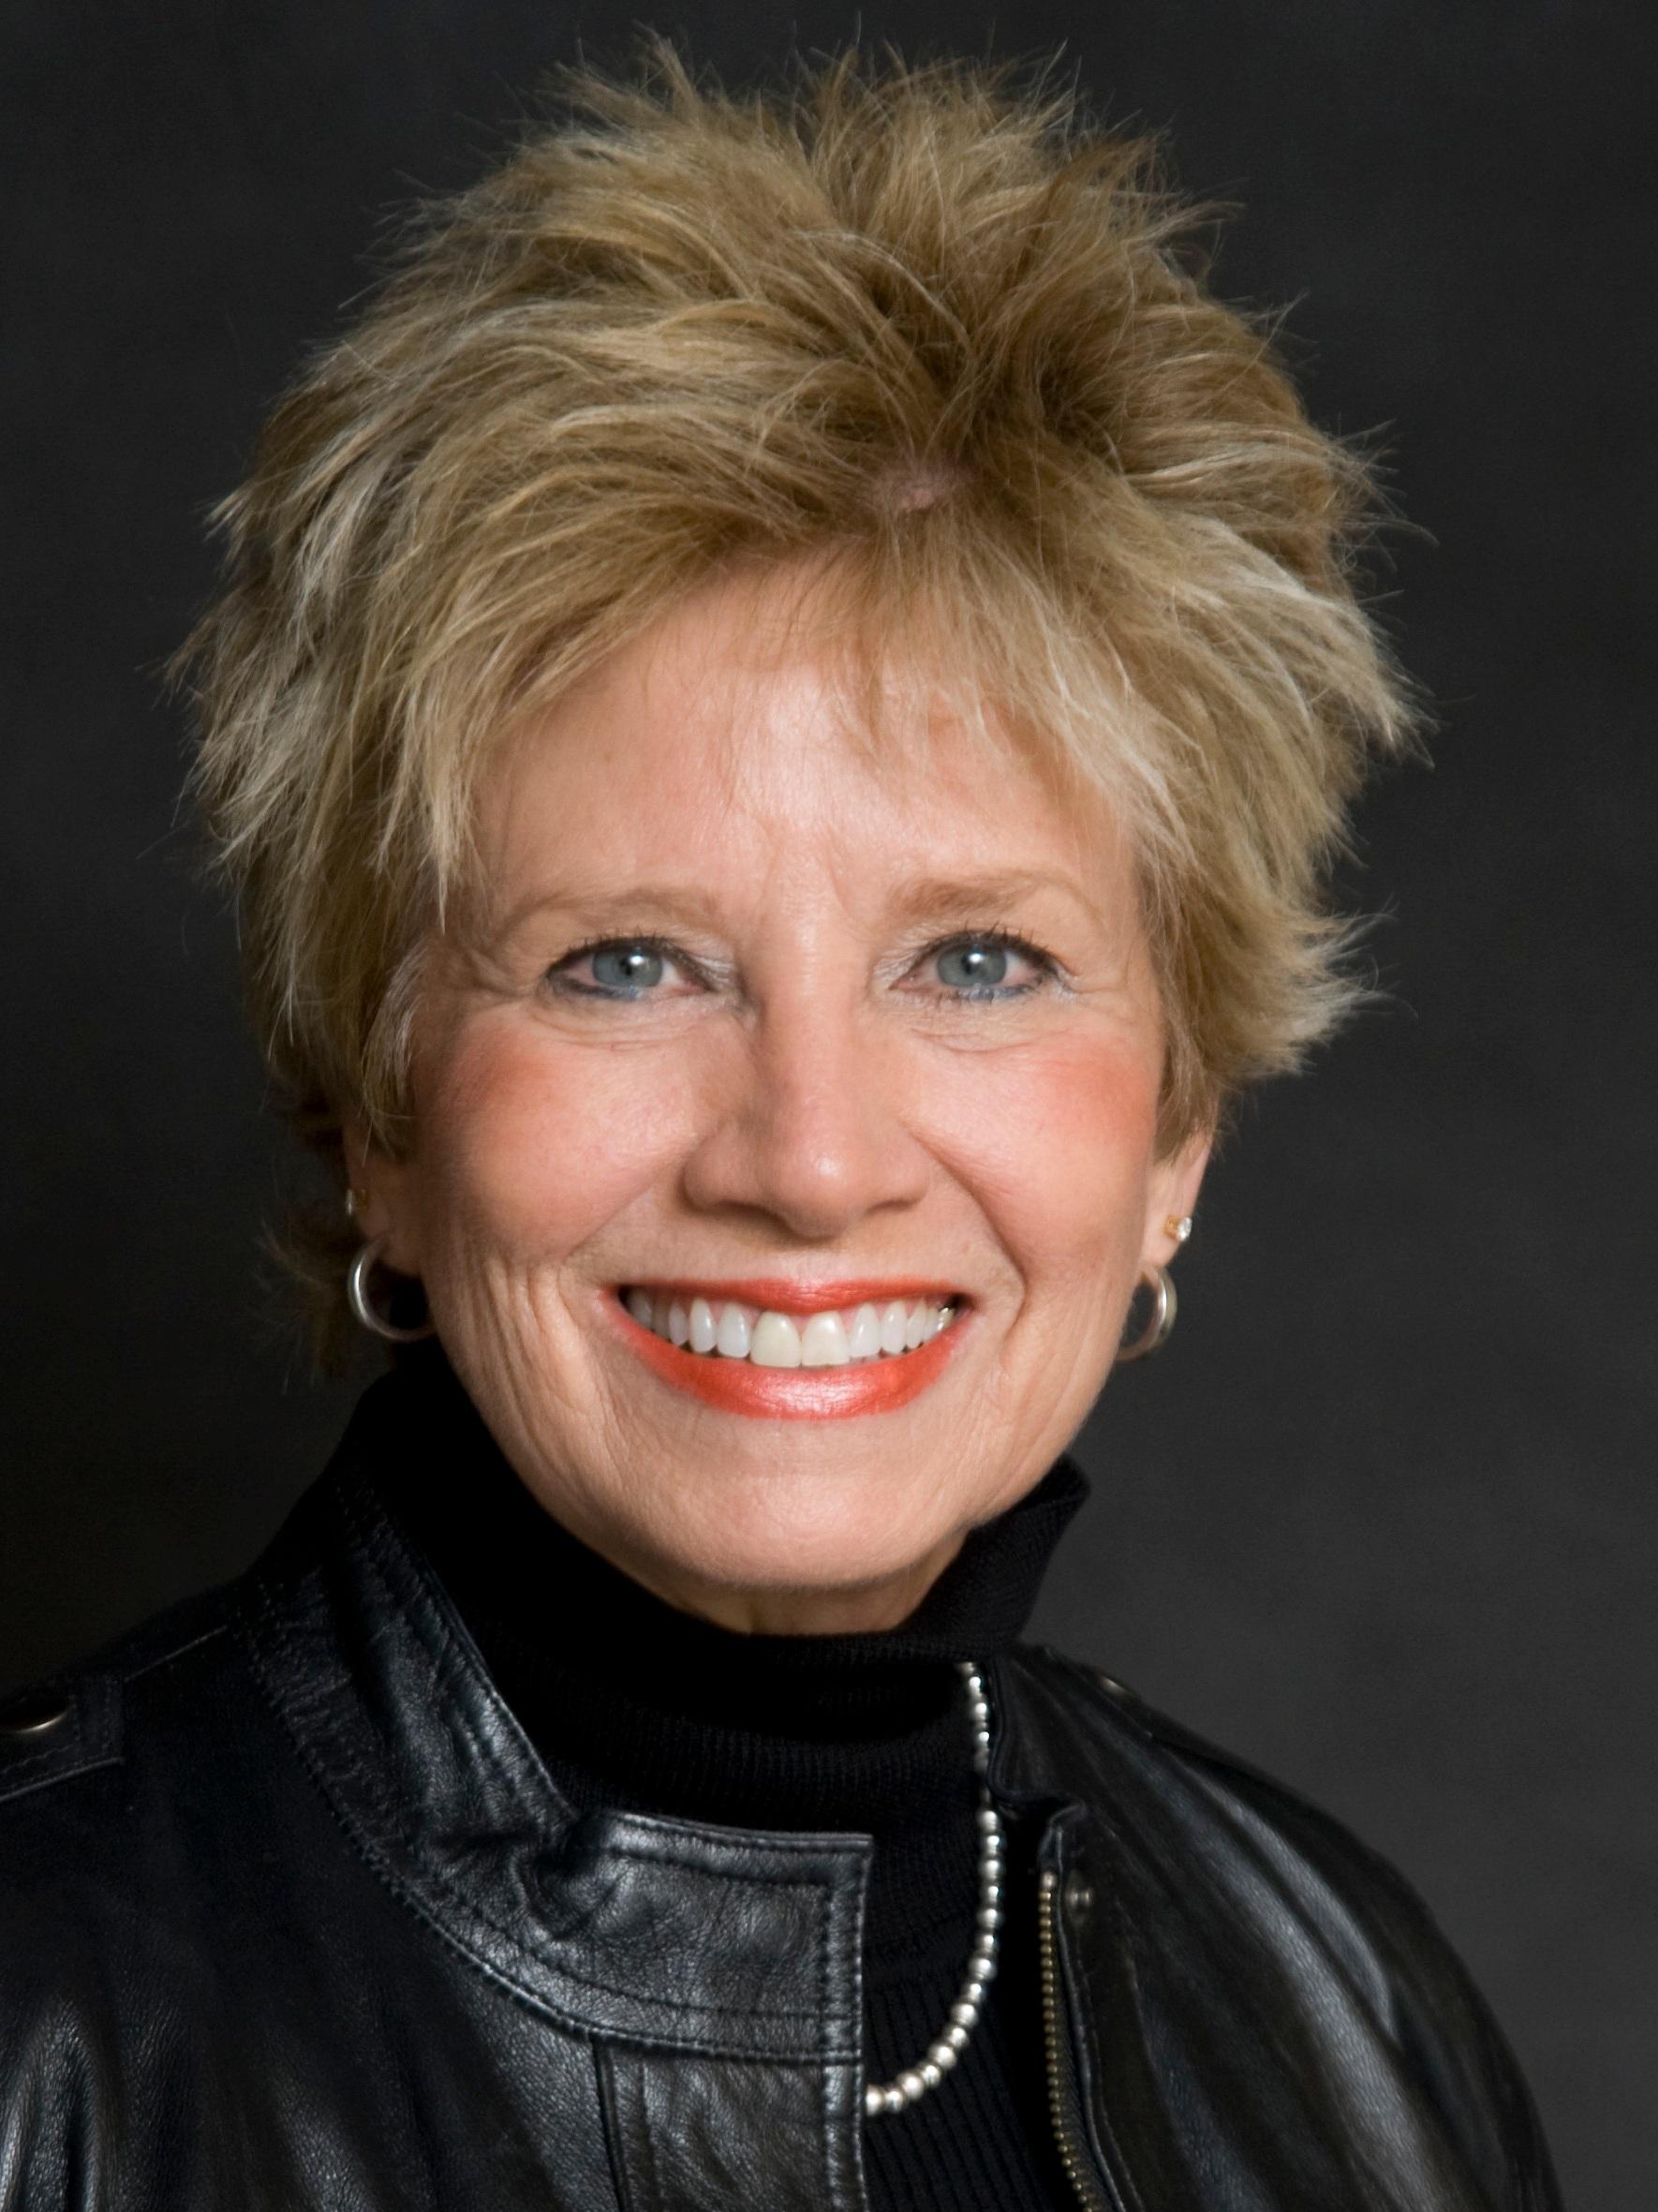 Jeannie Schoonover